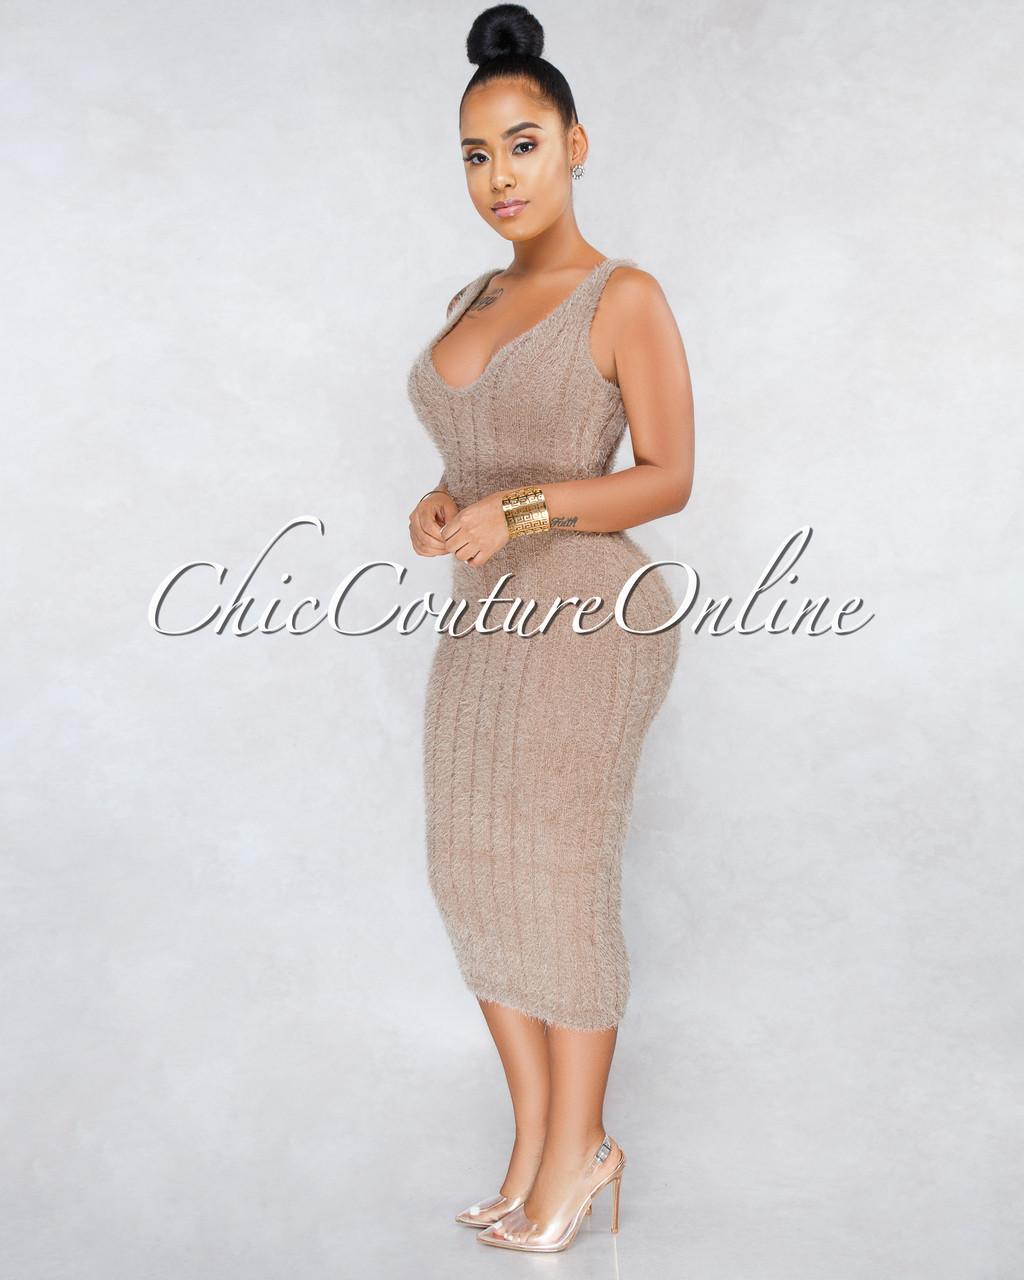 3a31b62ba26 Adeline Mocha Ribbed Fuzzy Midi Dress. Price   45.00. Image 1. Larger    More Photos